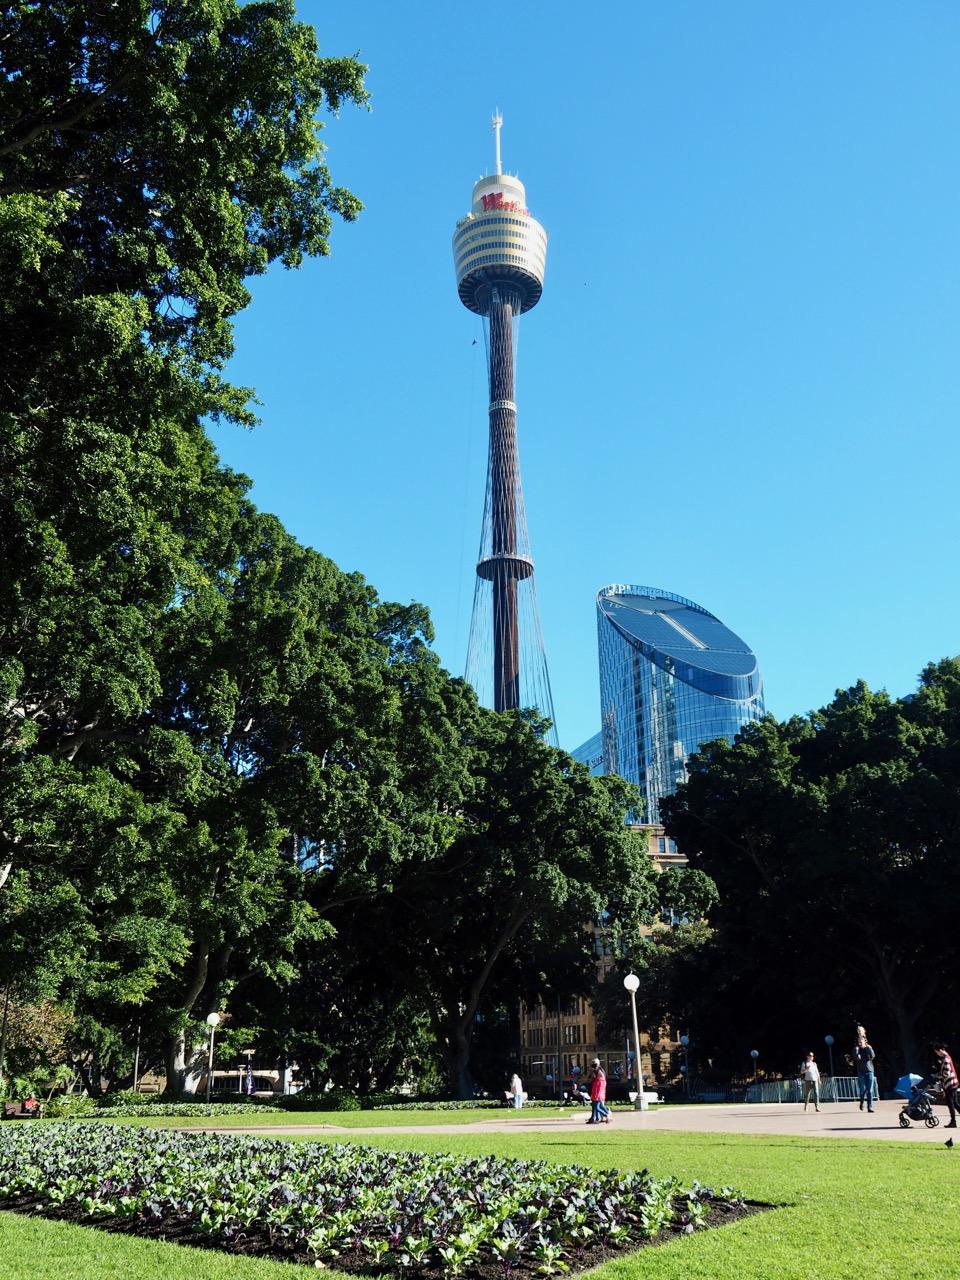 The Sydney Tower.